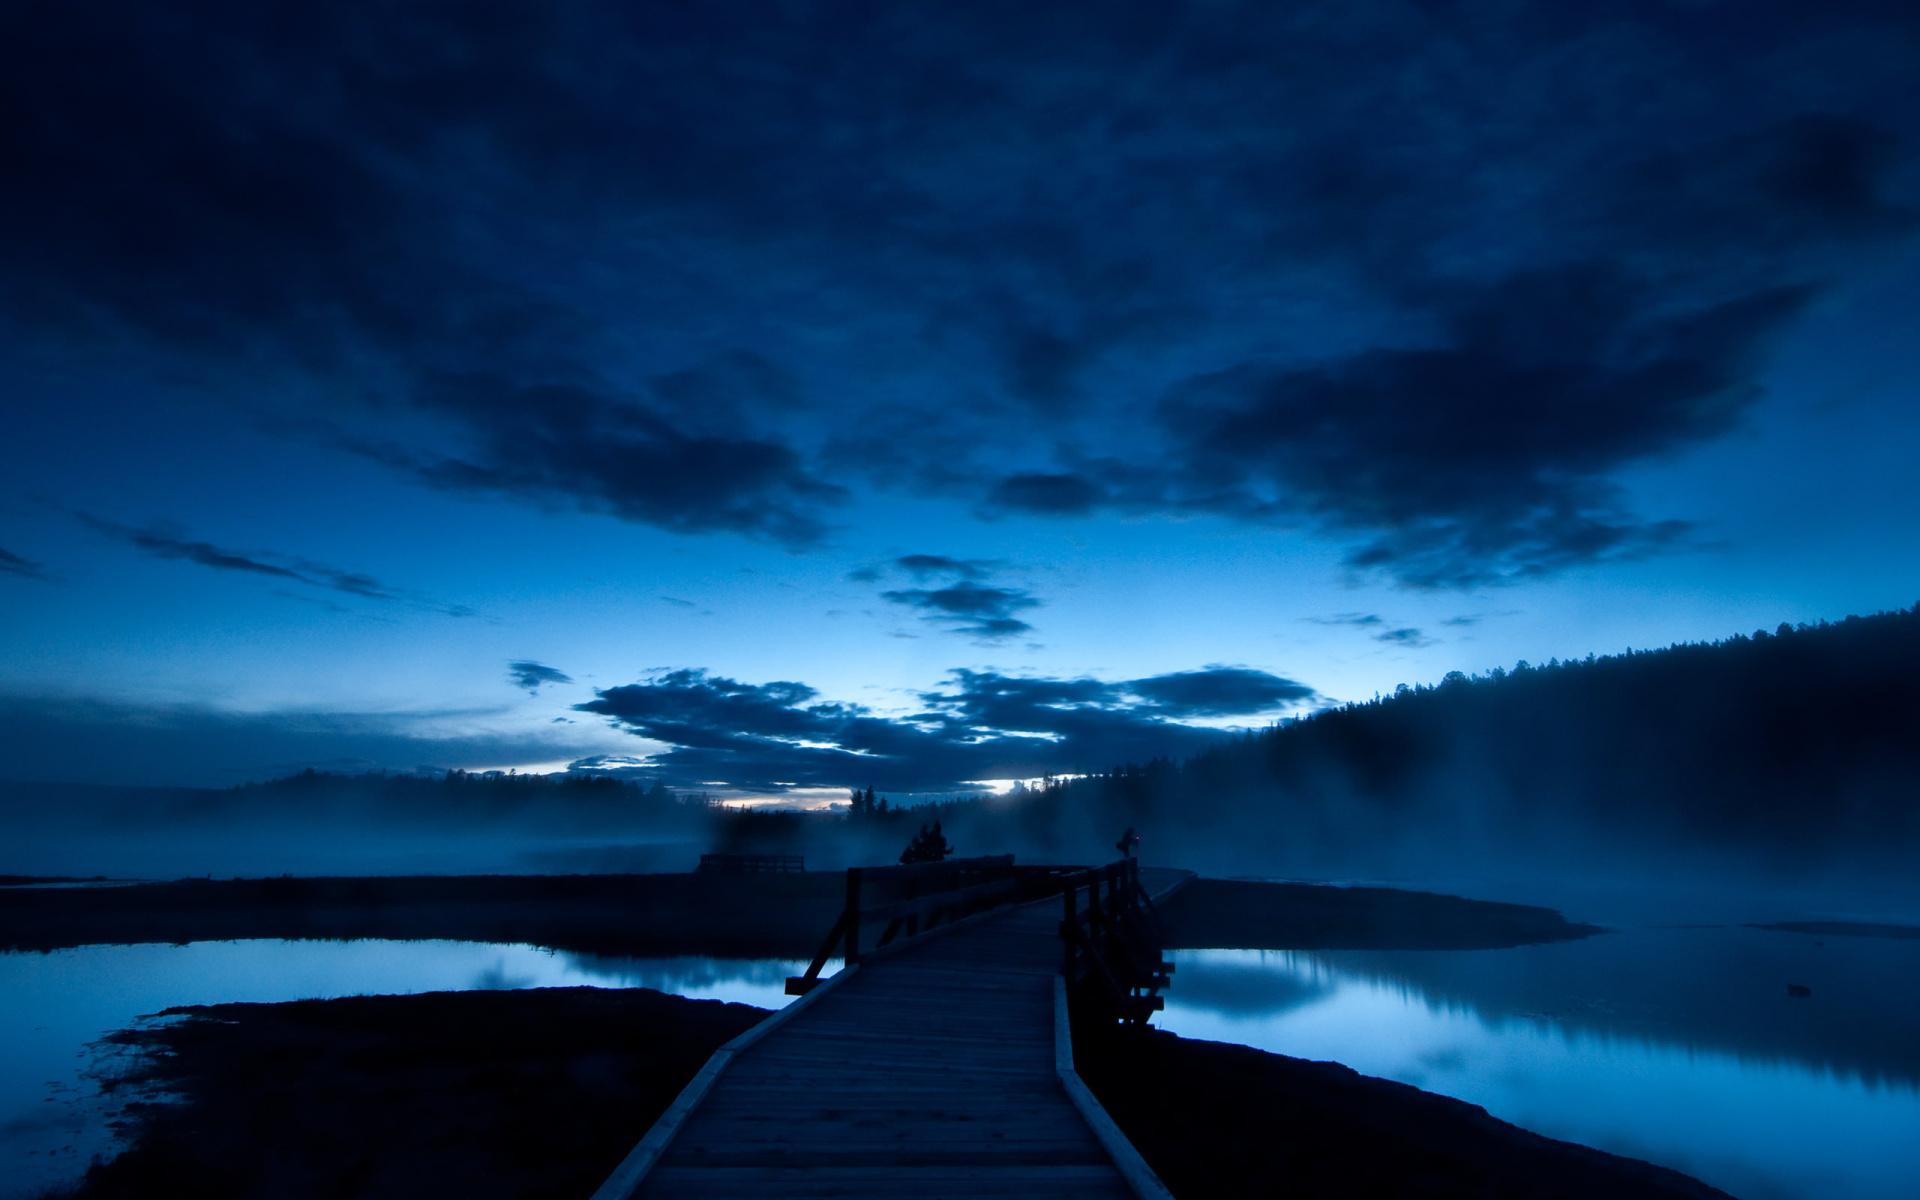 Blue Dusk HD